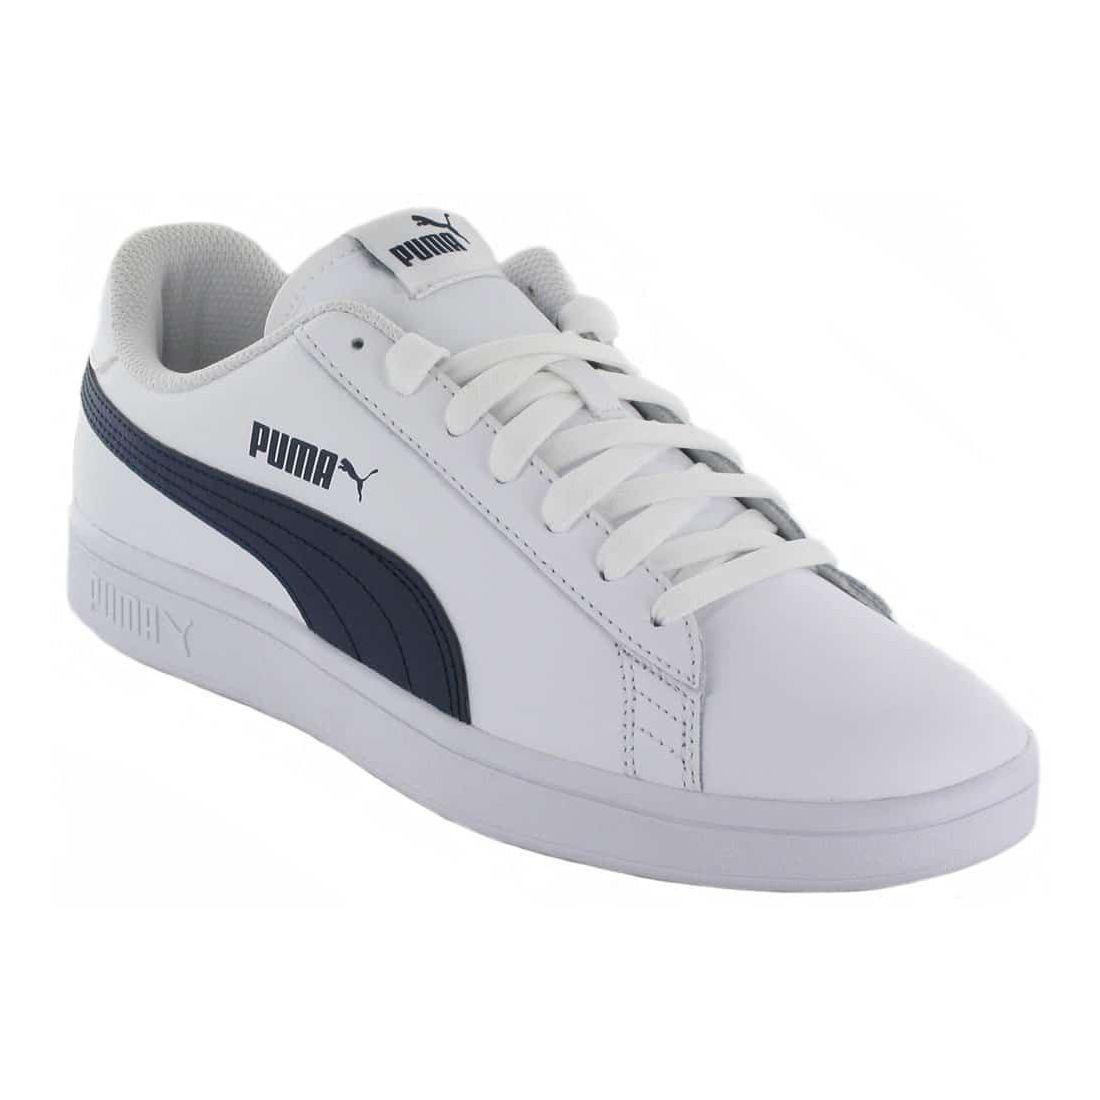 Puma Smash v2 L Blanco Puma Calzado Casual Hombre Lifestyle Tallas: 40, 41, 42, 43, 44, 45, 46, 47; Color: blanco